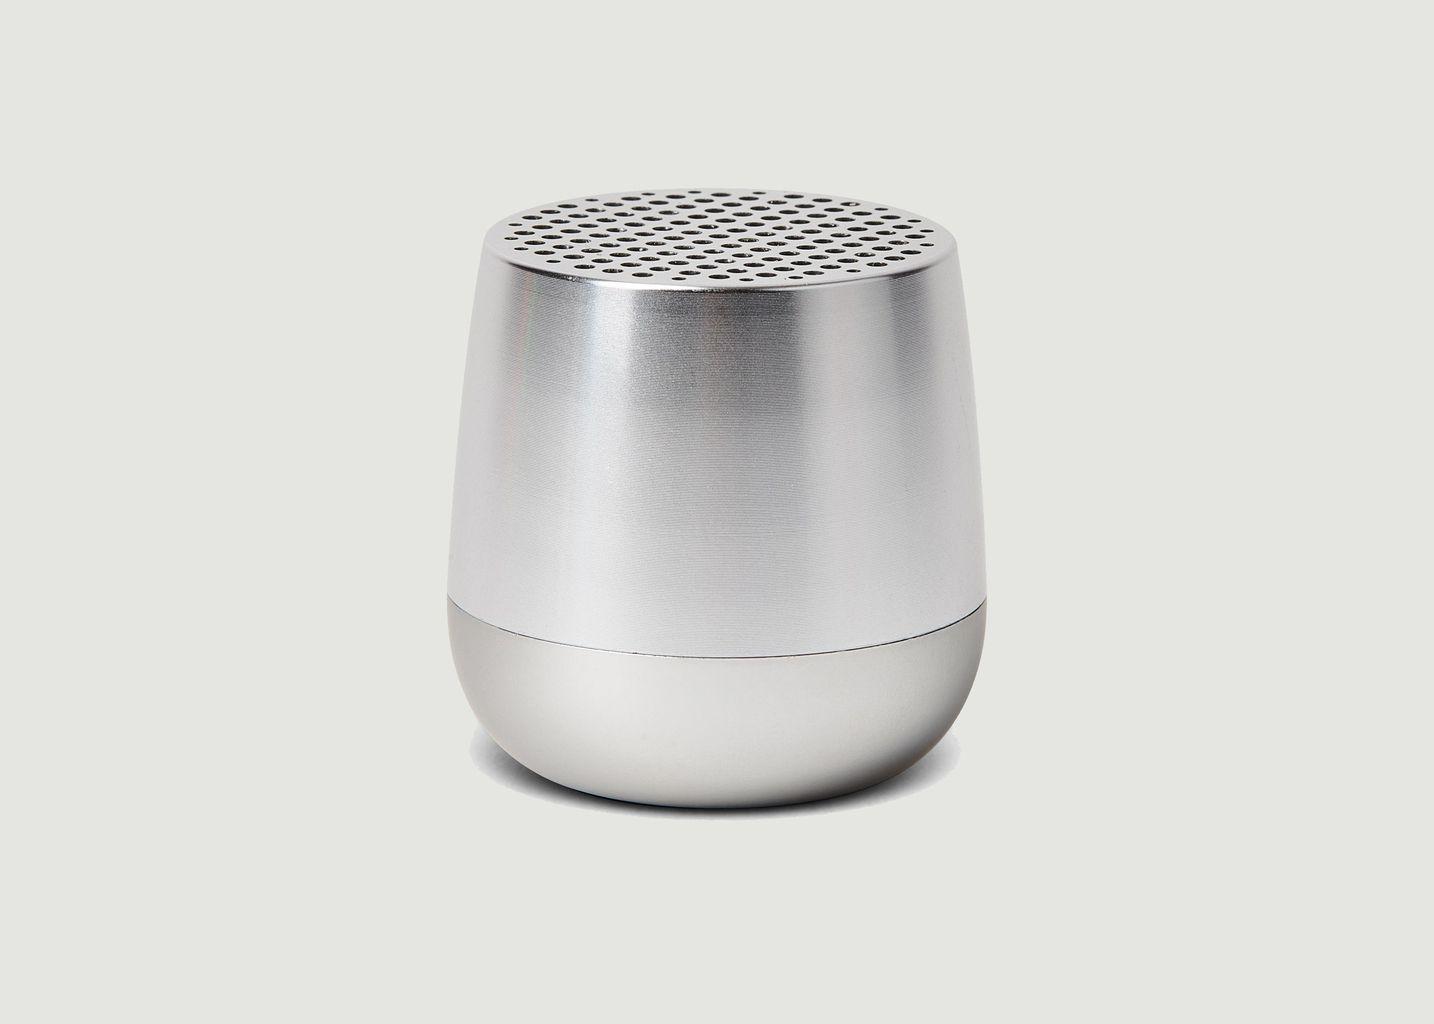 Mini Enceinte Bluetooth Mino + - Lexon Design